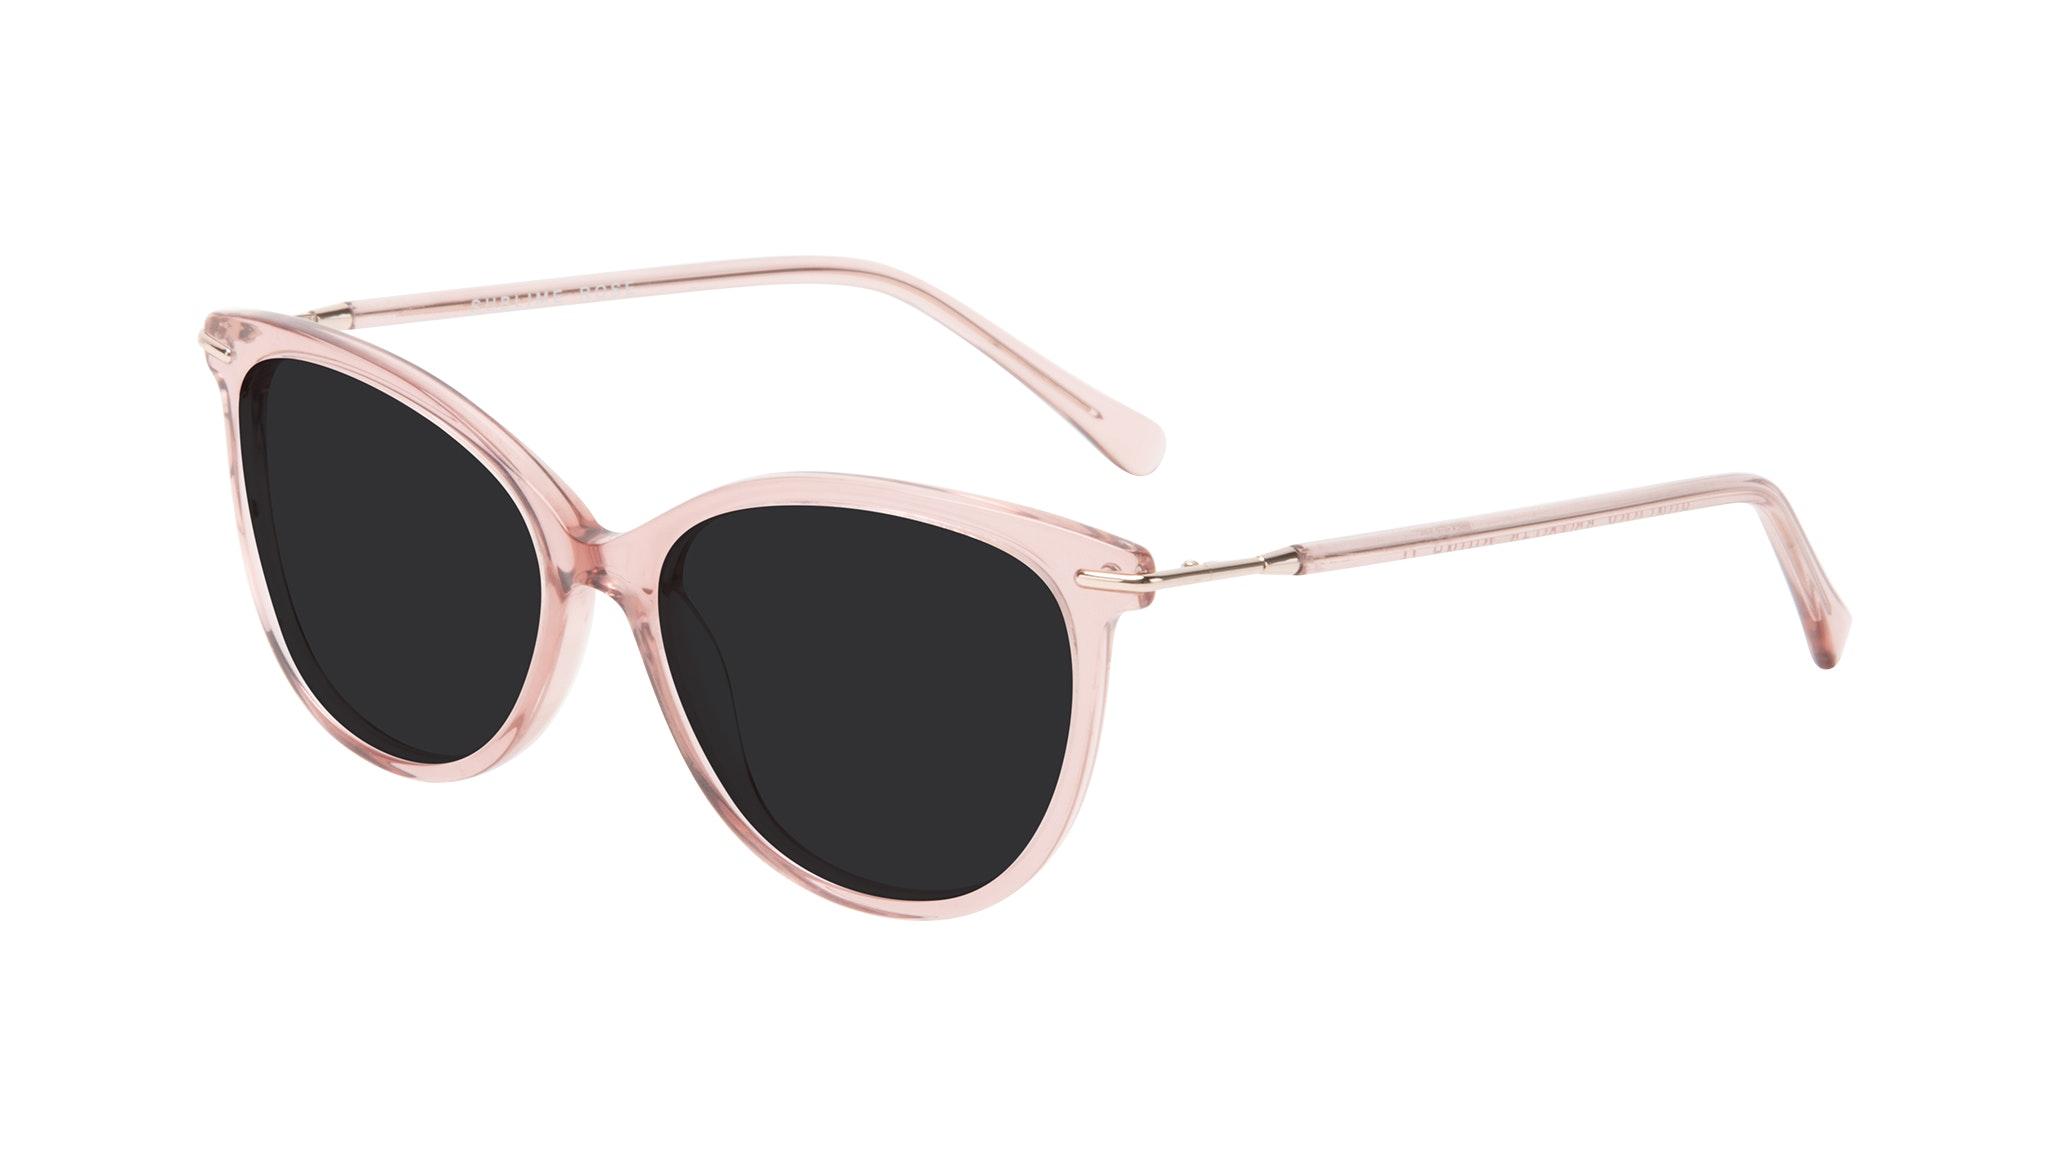 Affordable Fashion Glasses Round Sunglasses Women Sublime Rose Tilt